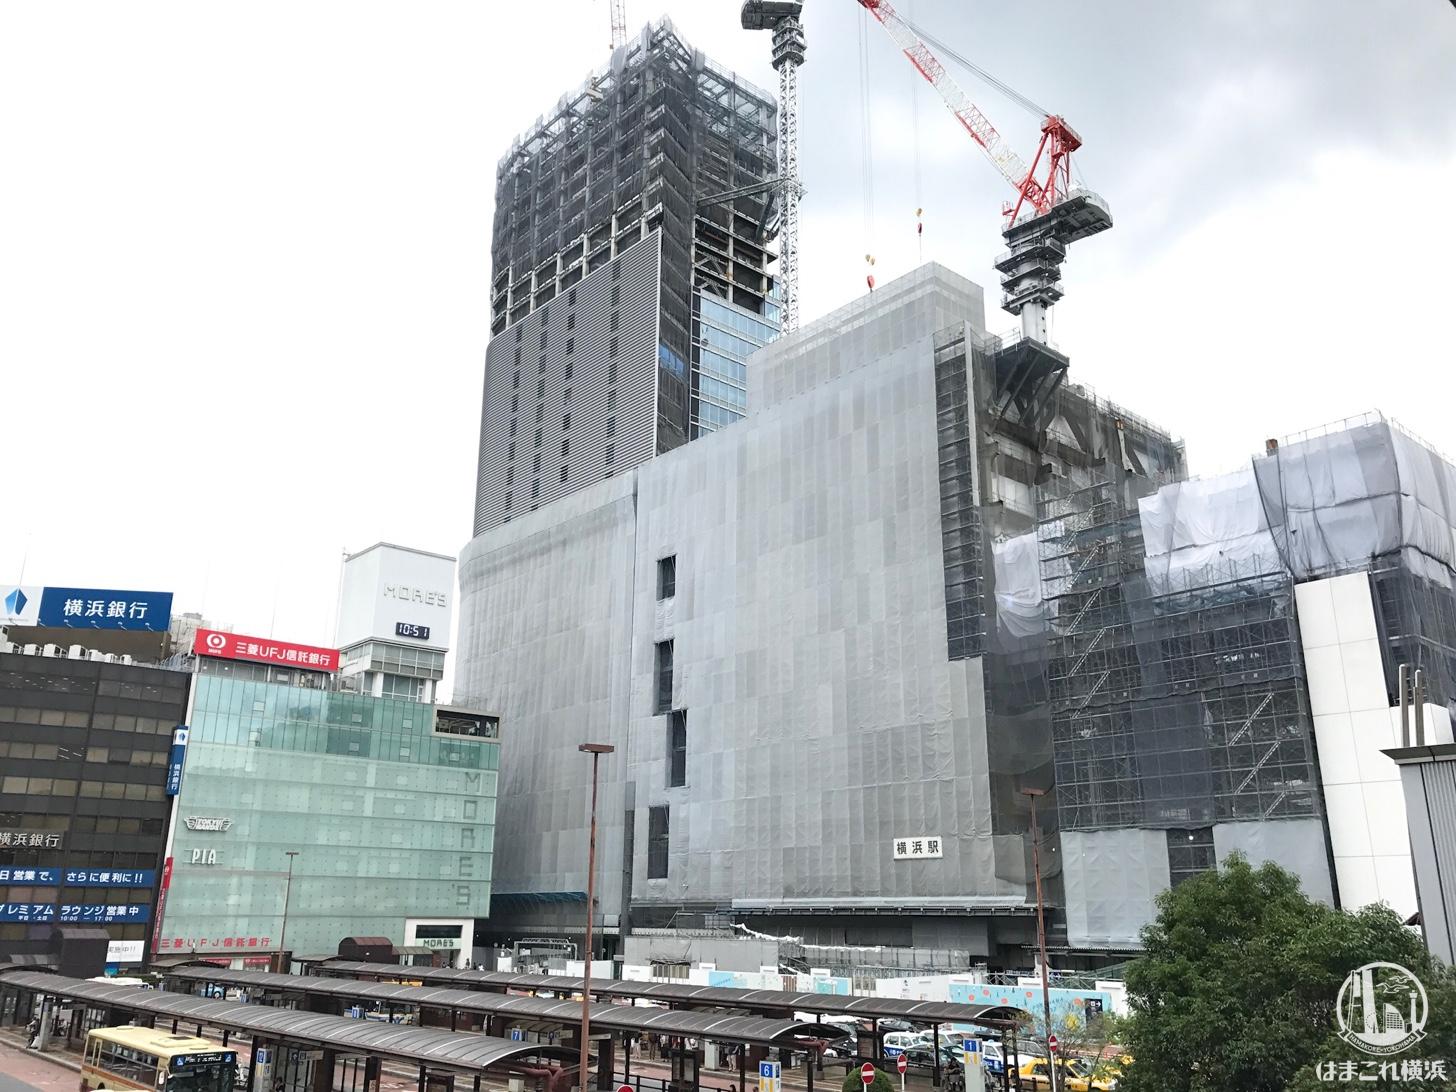 2018年9月 横浜駅西口の様子